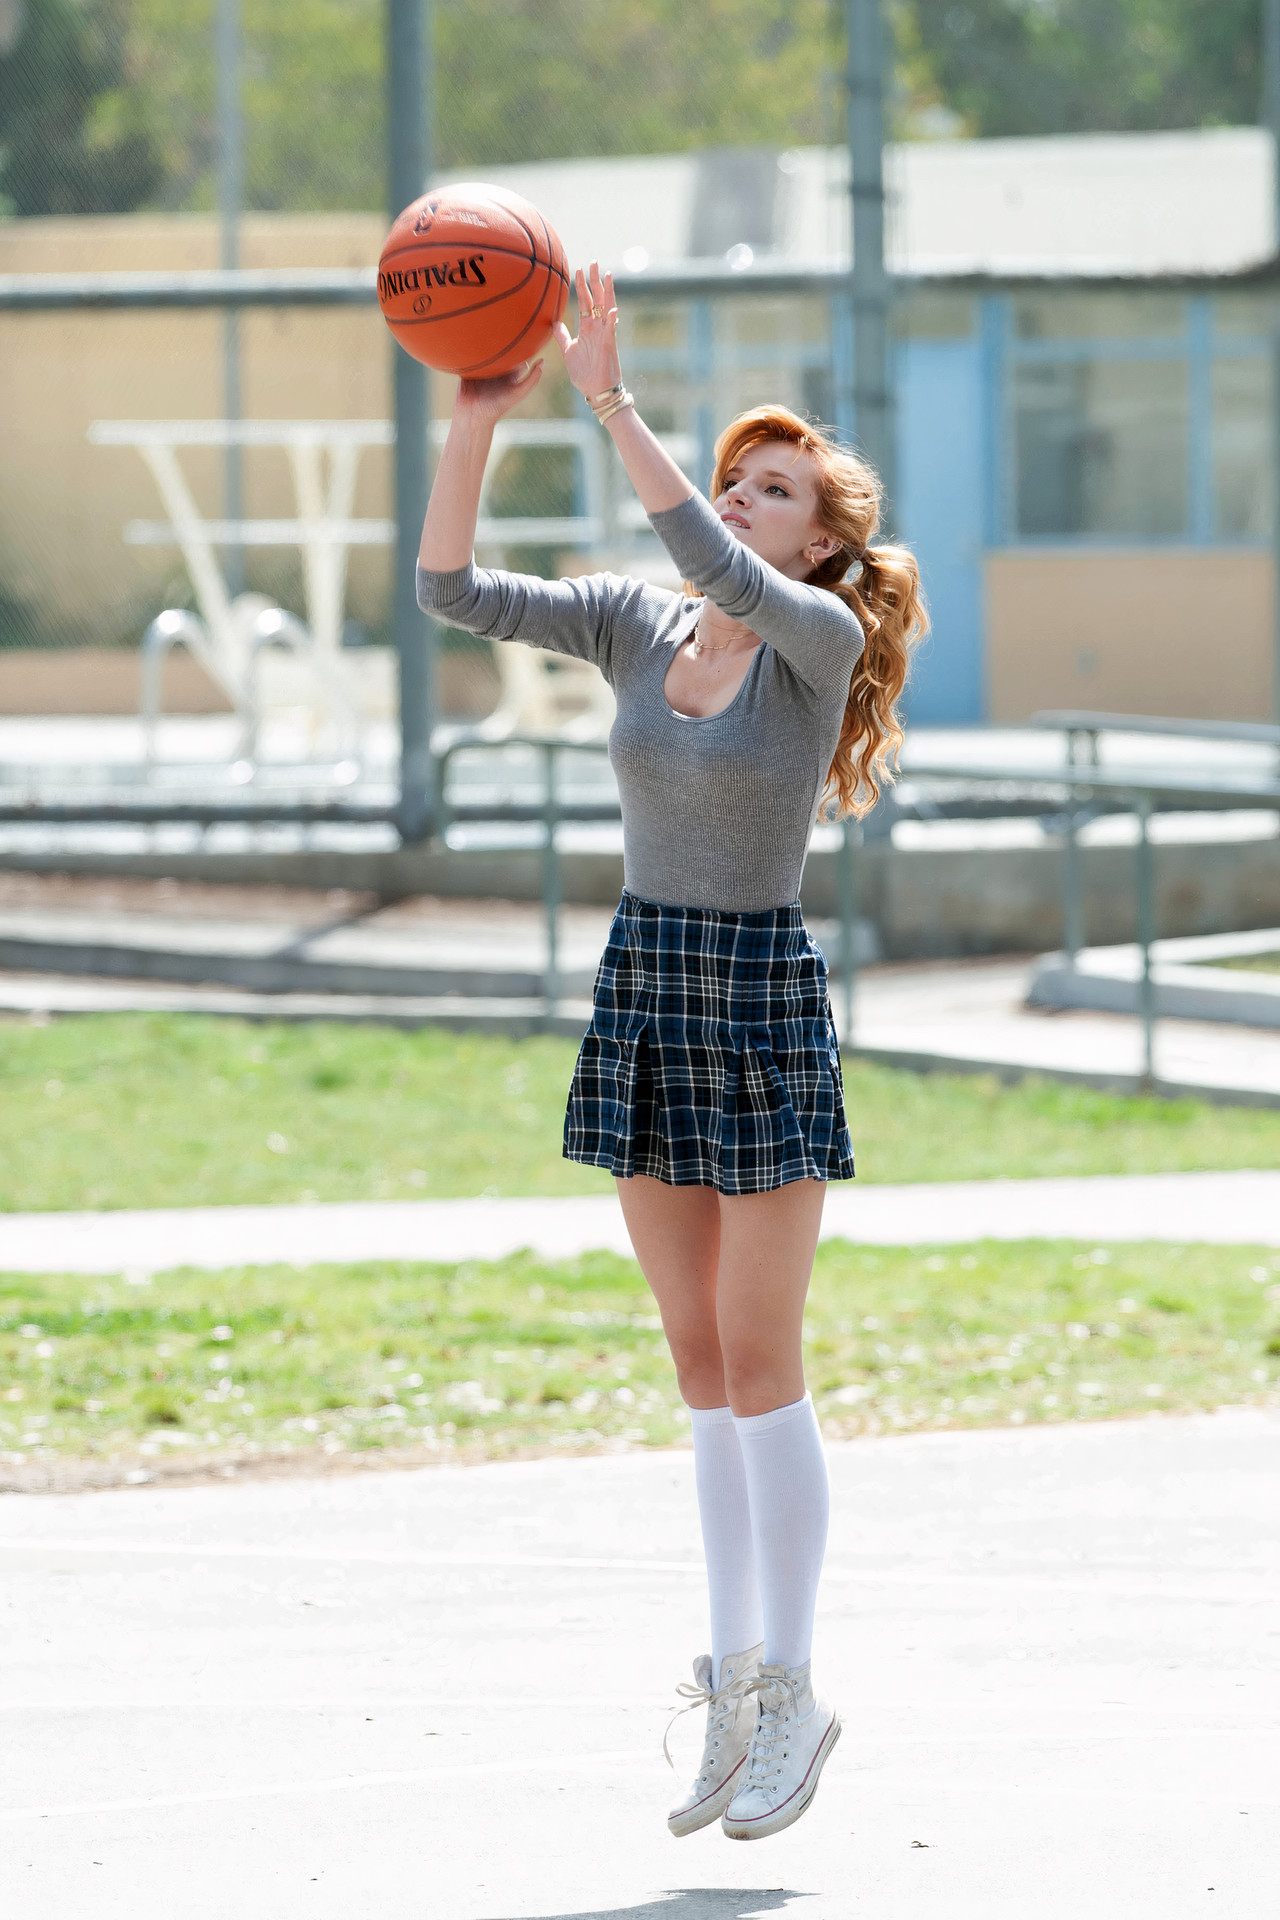 Bella Thorne Women Actress Legs Basketball Movies Redhead Sneakers Knee High Socks Long Hair Jumping 1280x1920